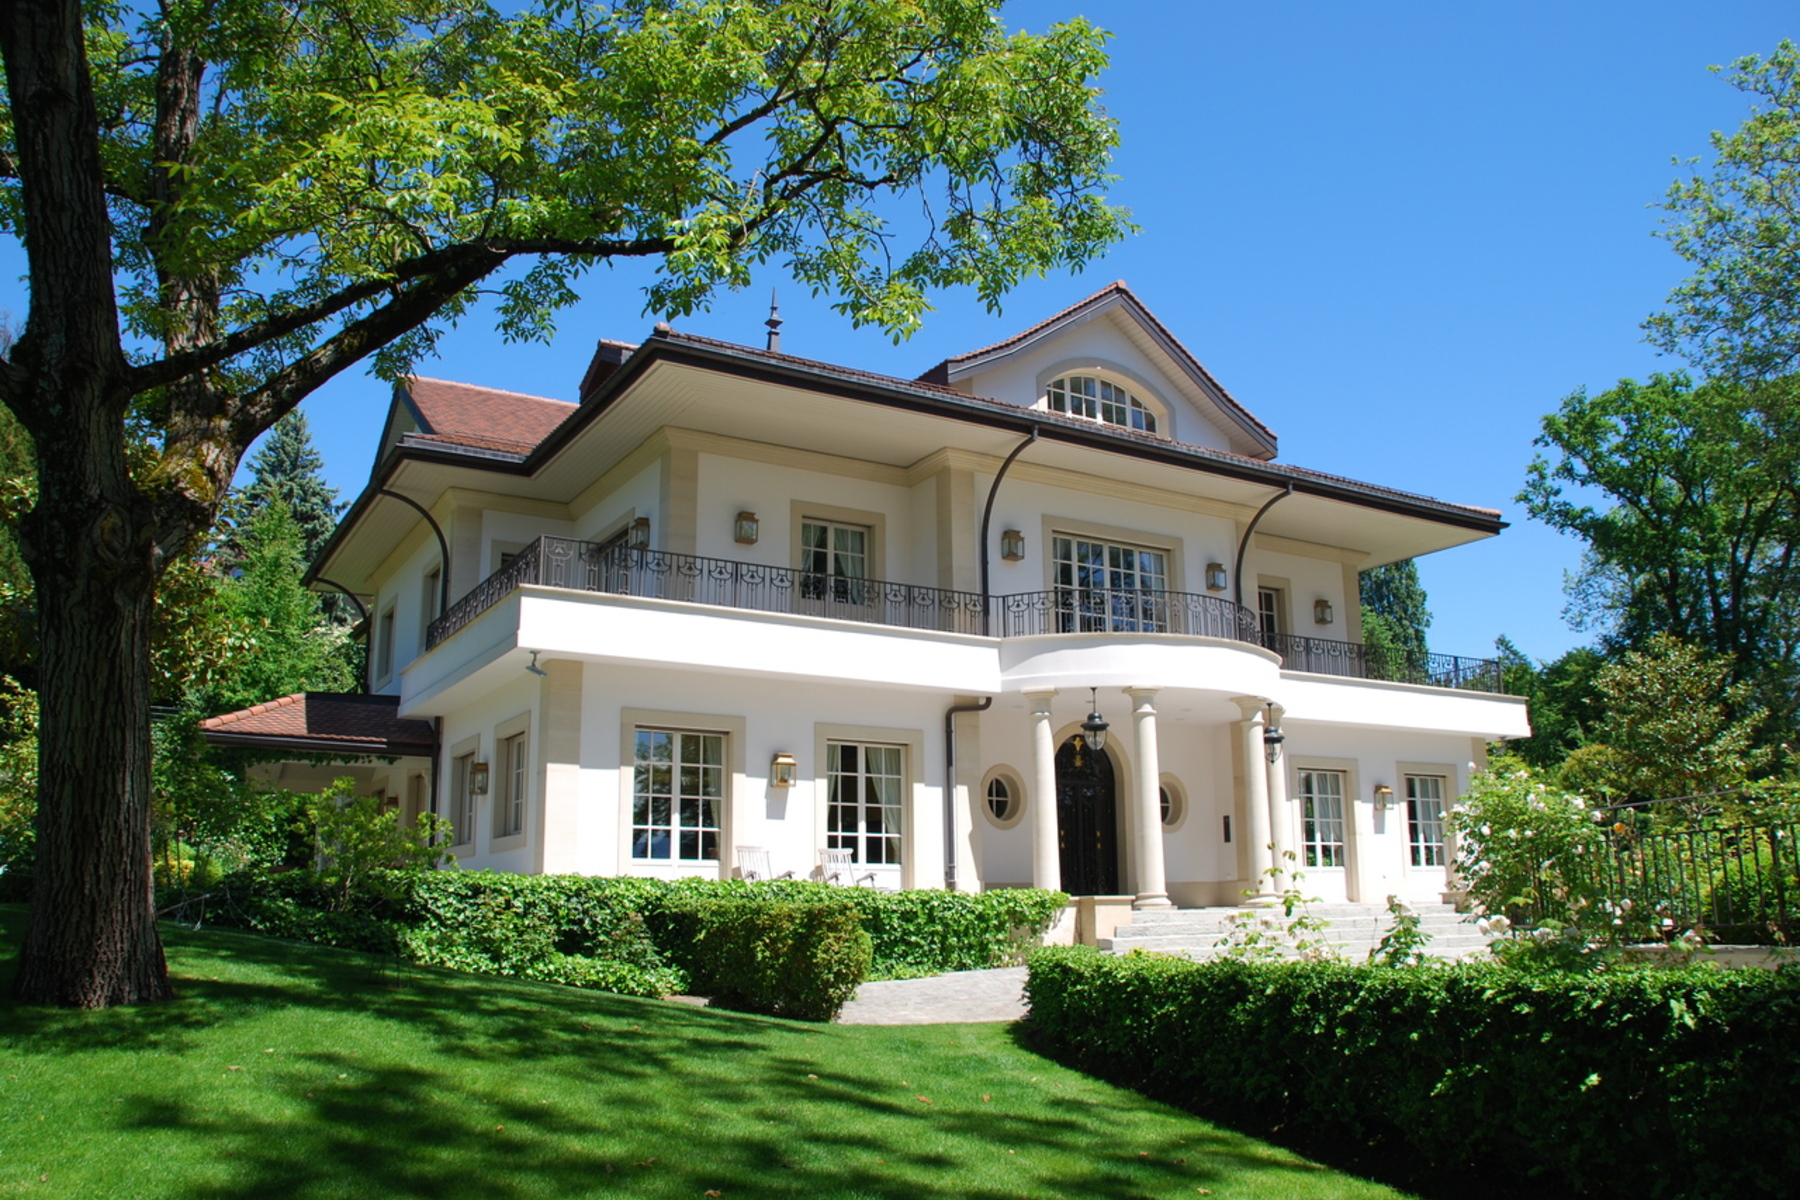 Single Family Homes for Active at Superb mansion close to Denantou park Lausanne Lausanne, Vaud 1006 Switzerland